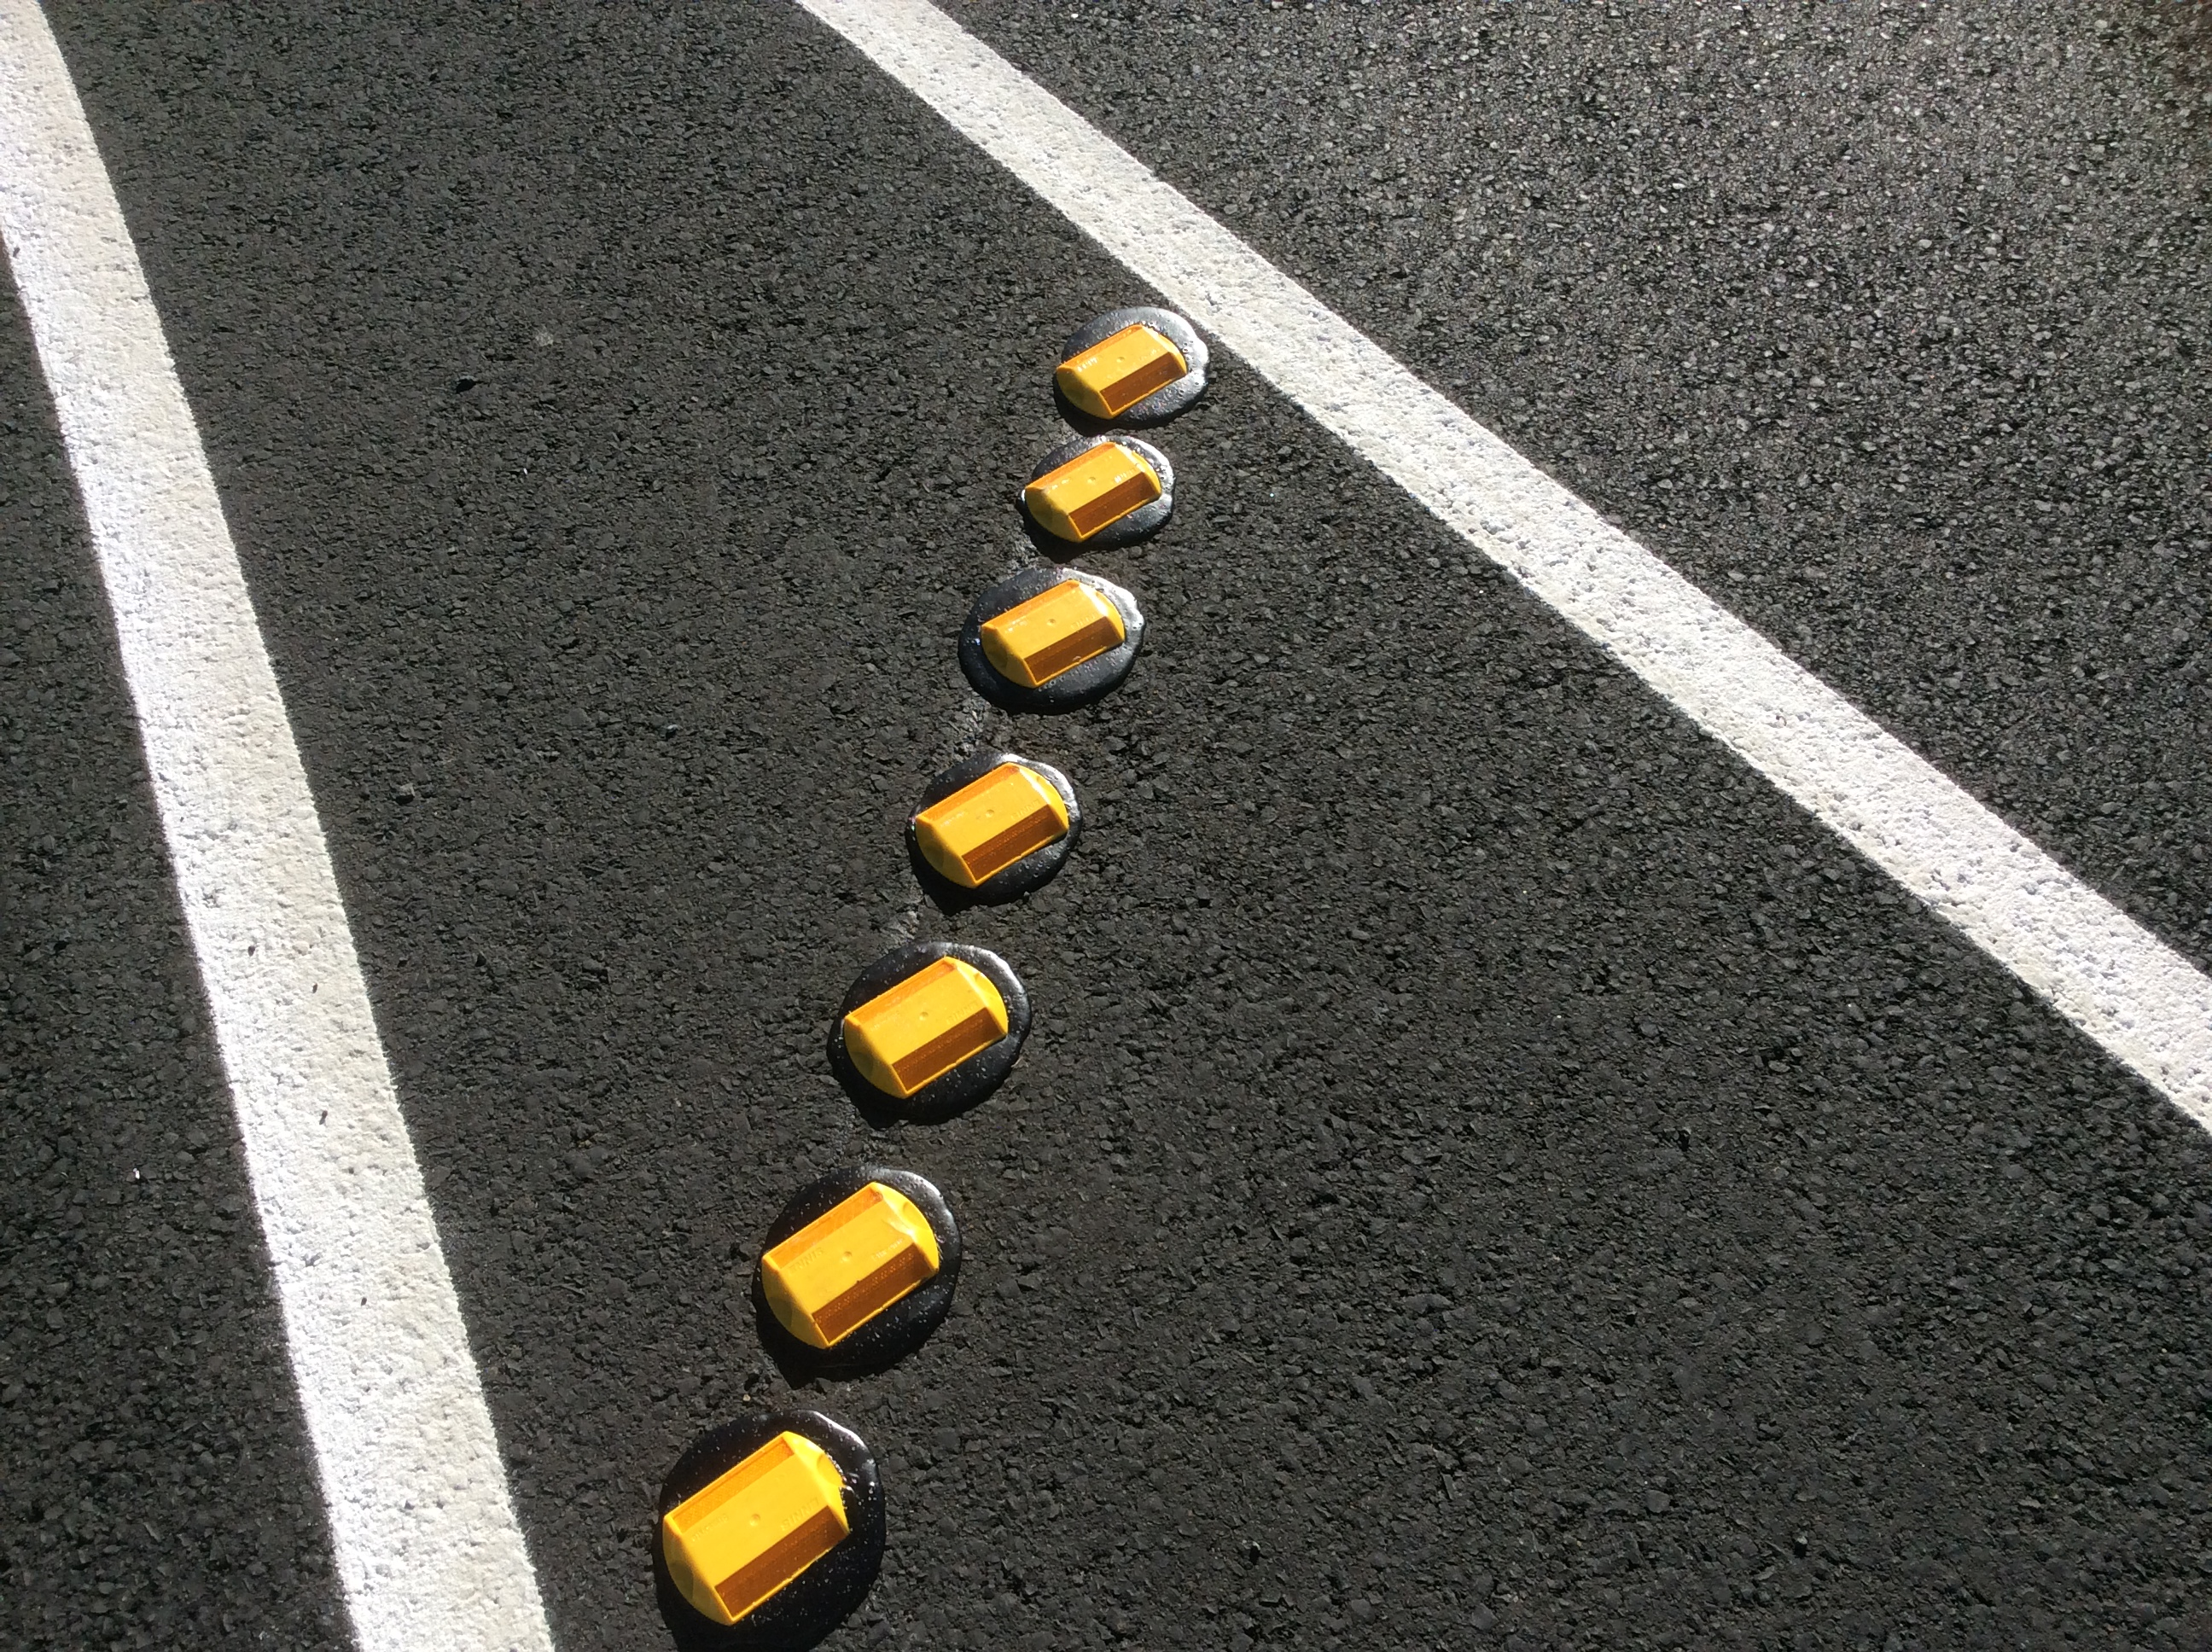 Raise Reflective Pavement Markers